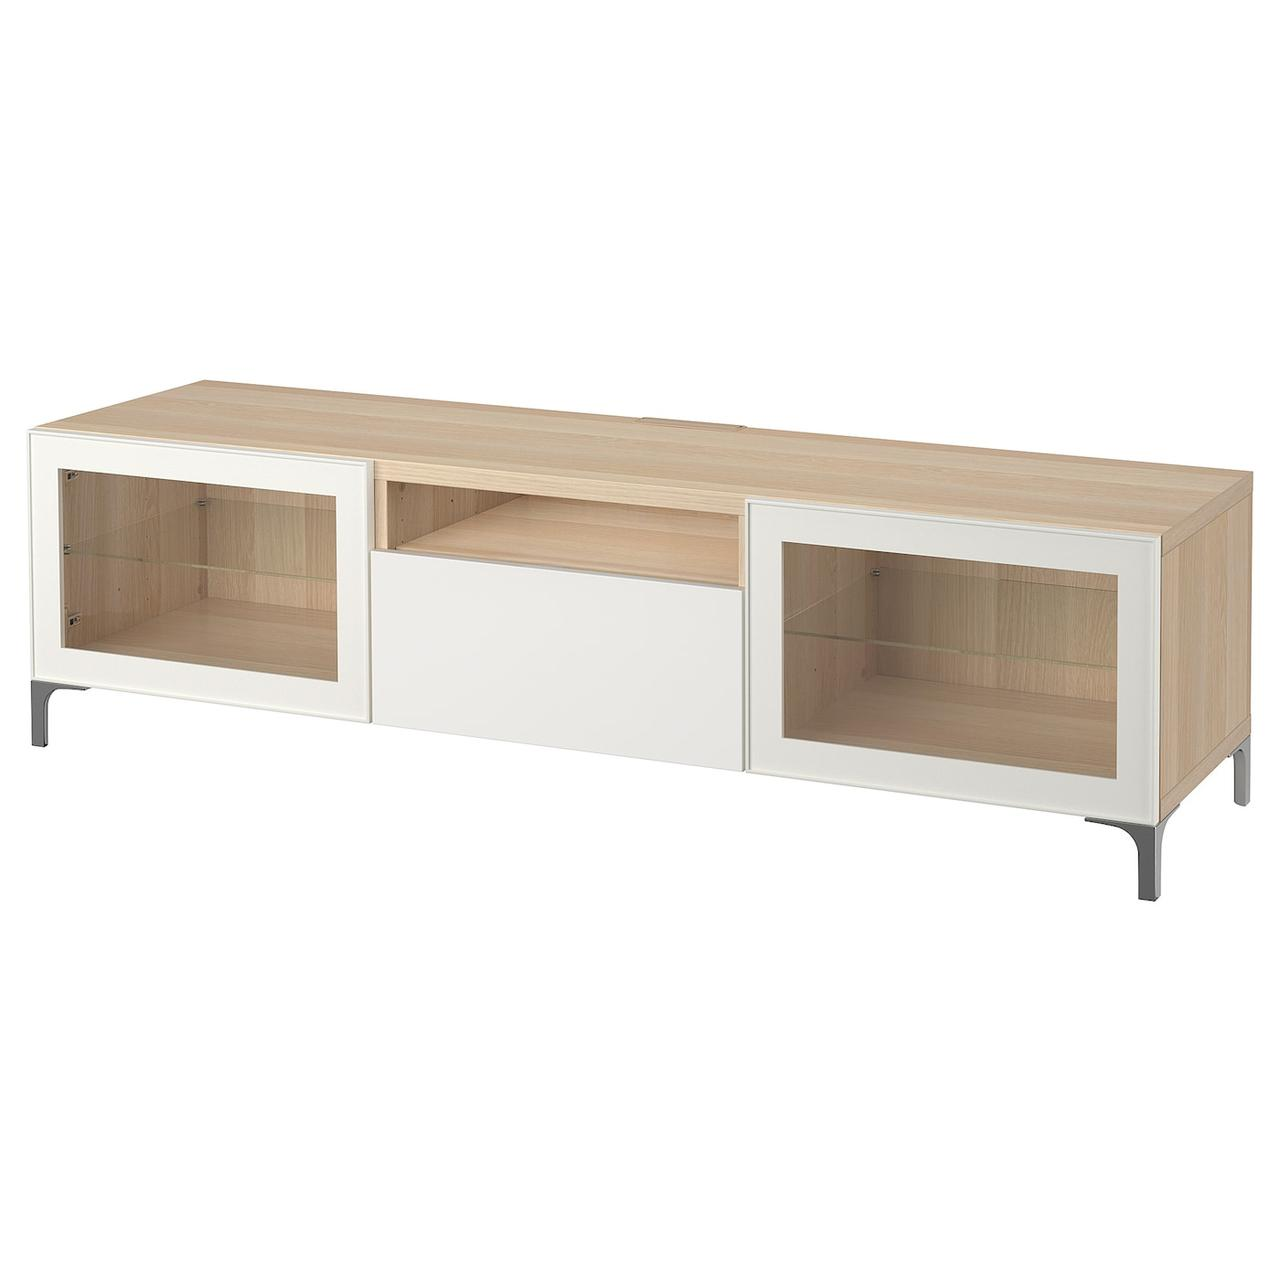 IKEA BESTÅ Тумба под ТВ 180x42x48 см